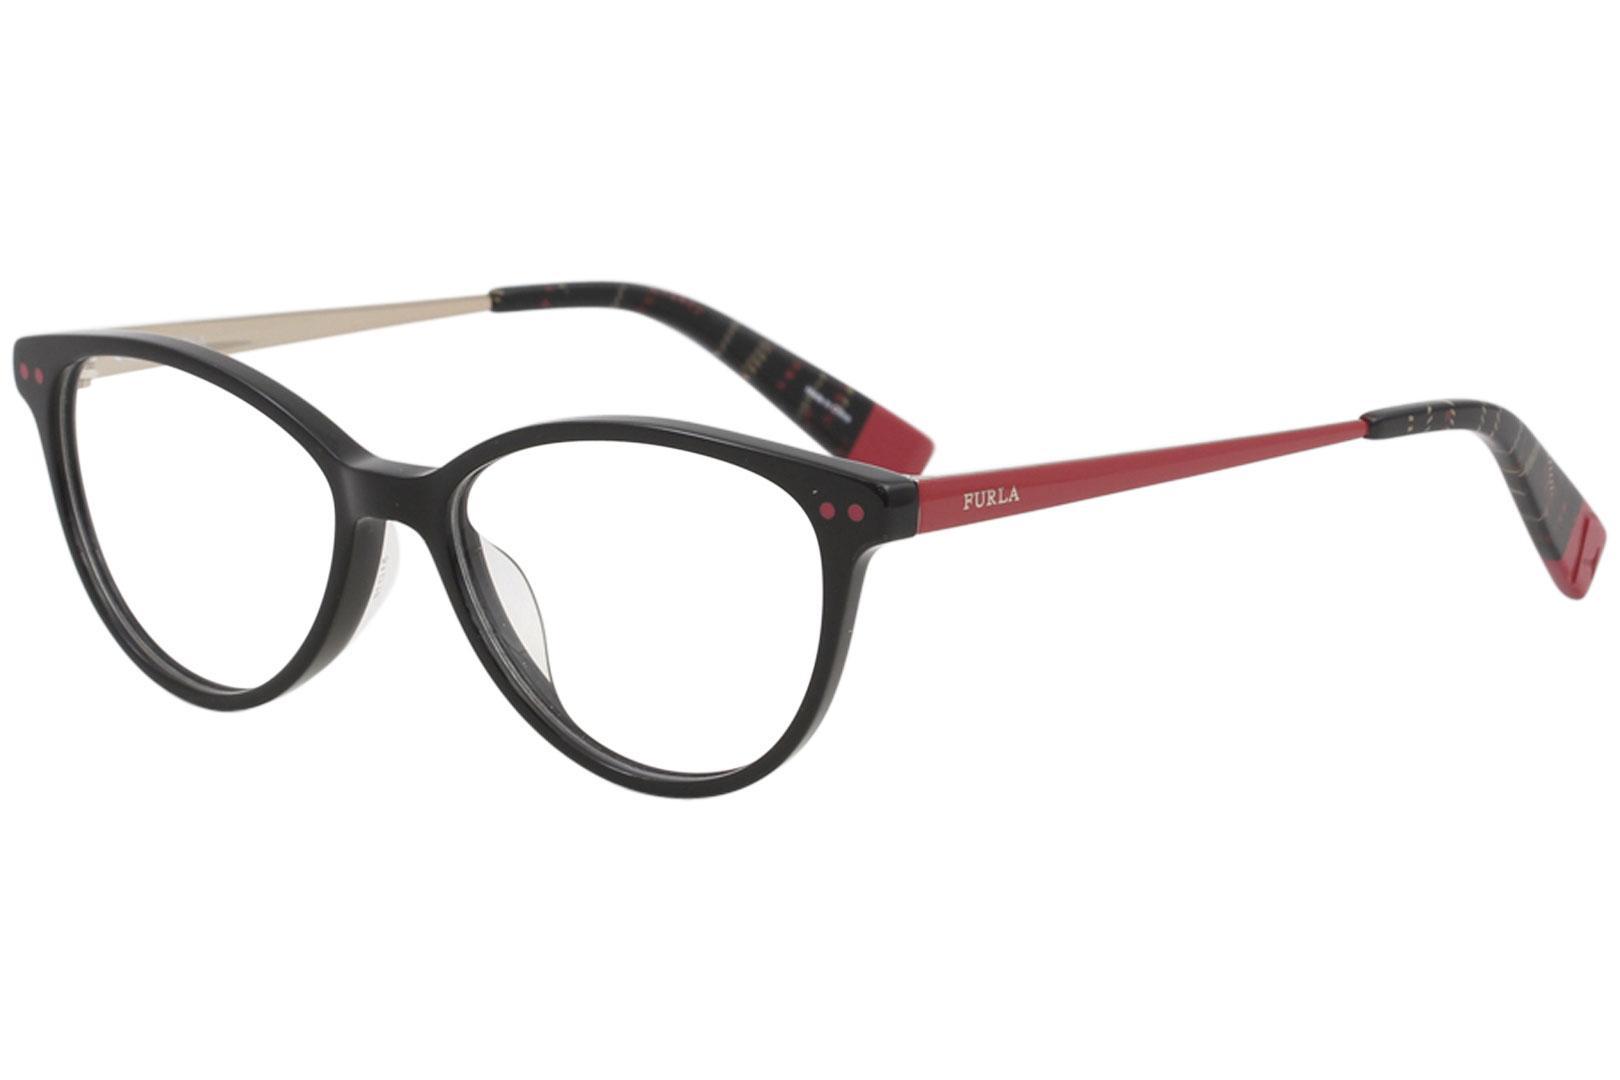 Image of Furla Women's Eyeglasses VFU083 VFU/083 0700 Black Full Rim Optical Frame 51mm -  Black   0700 - Lens 51 Bridge 16 B 39 ED 56 Temple 140mm